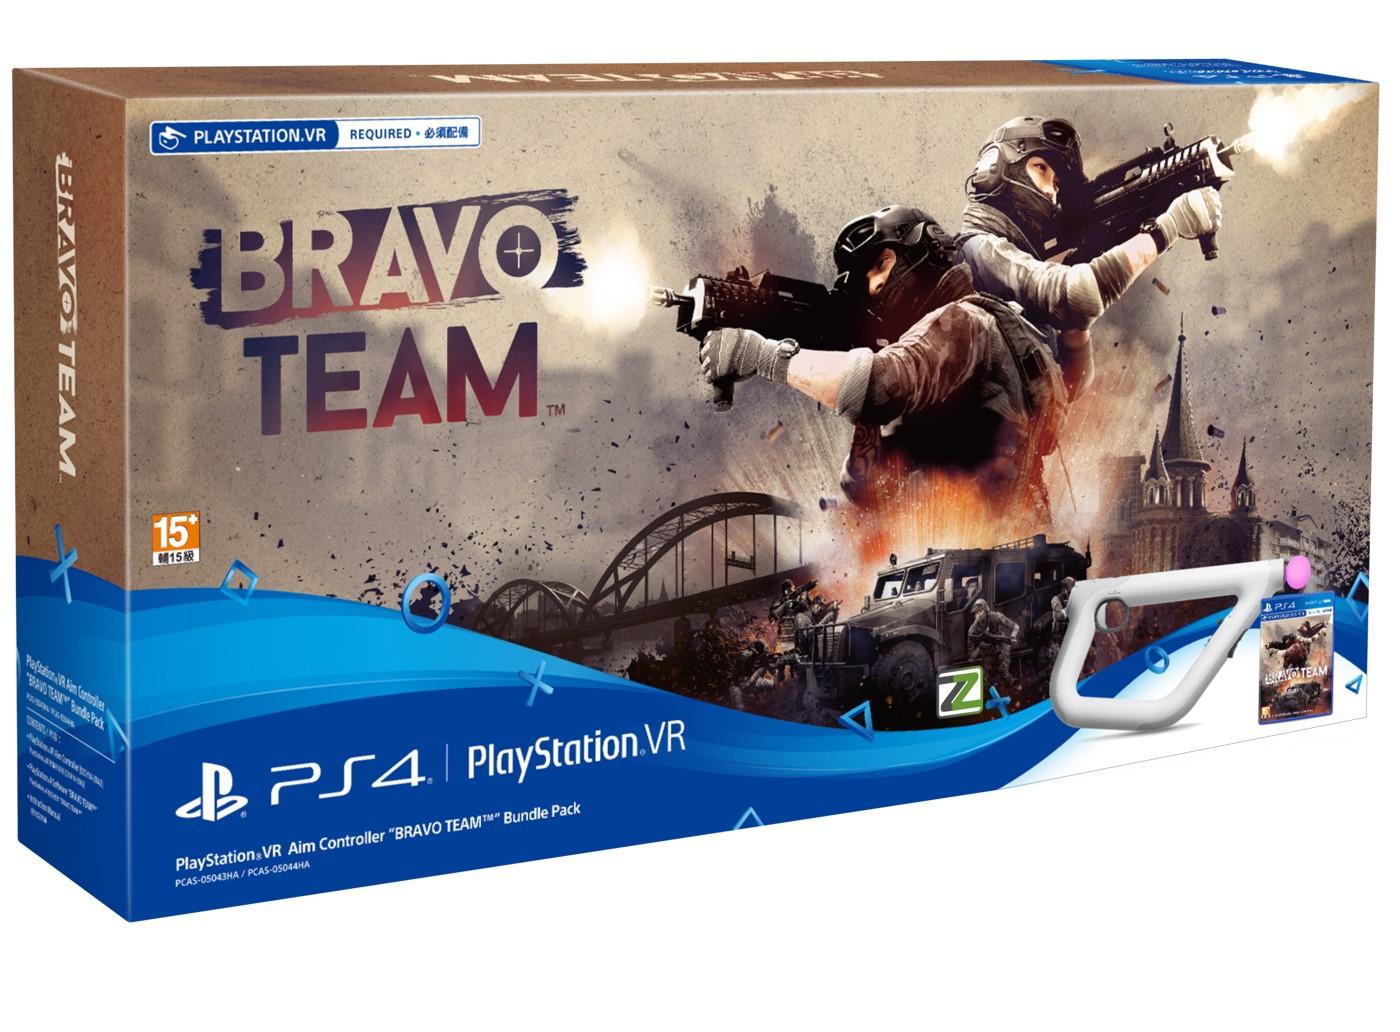 Bravo Team PS4 VR + Sony PlayStation VR Aim Controller